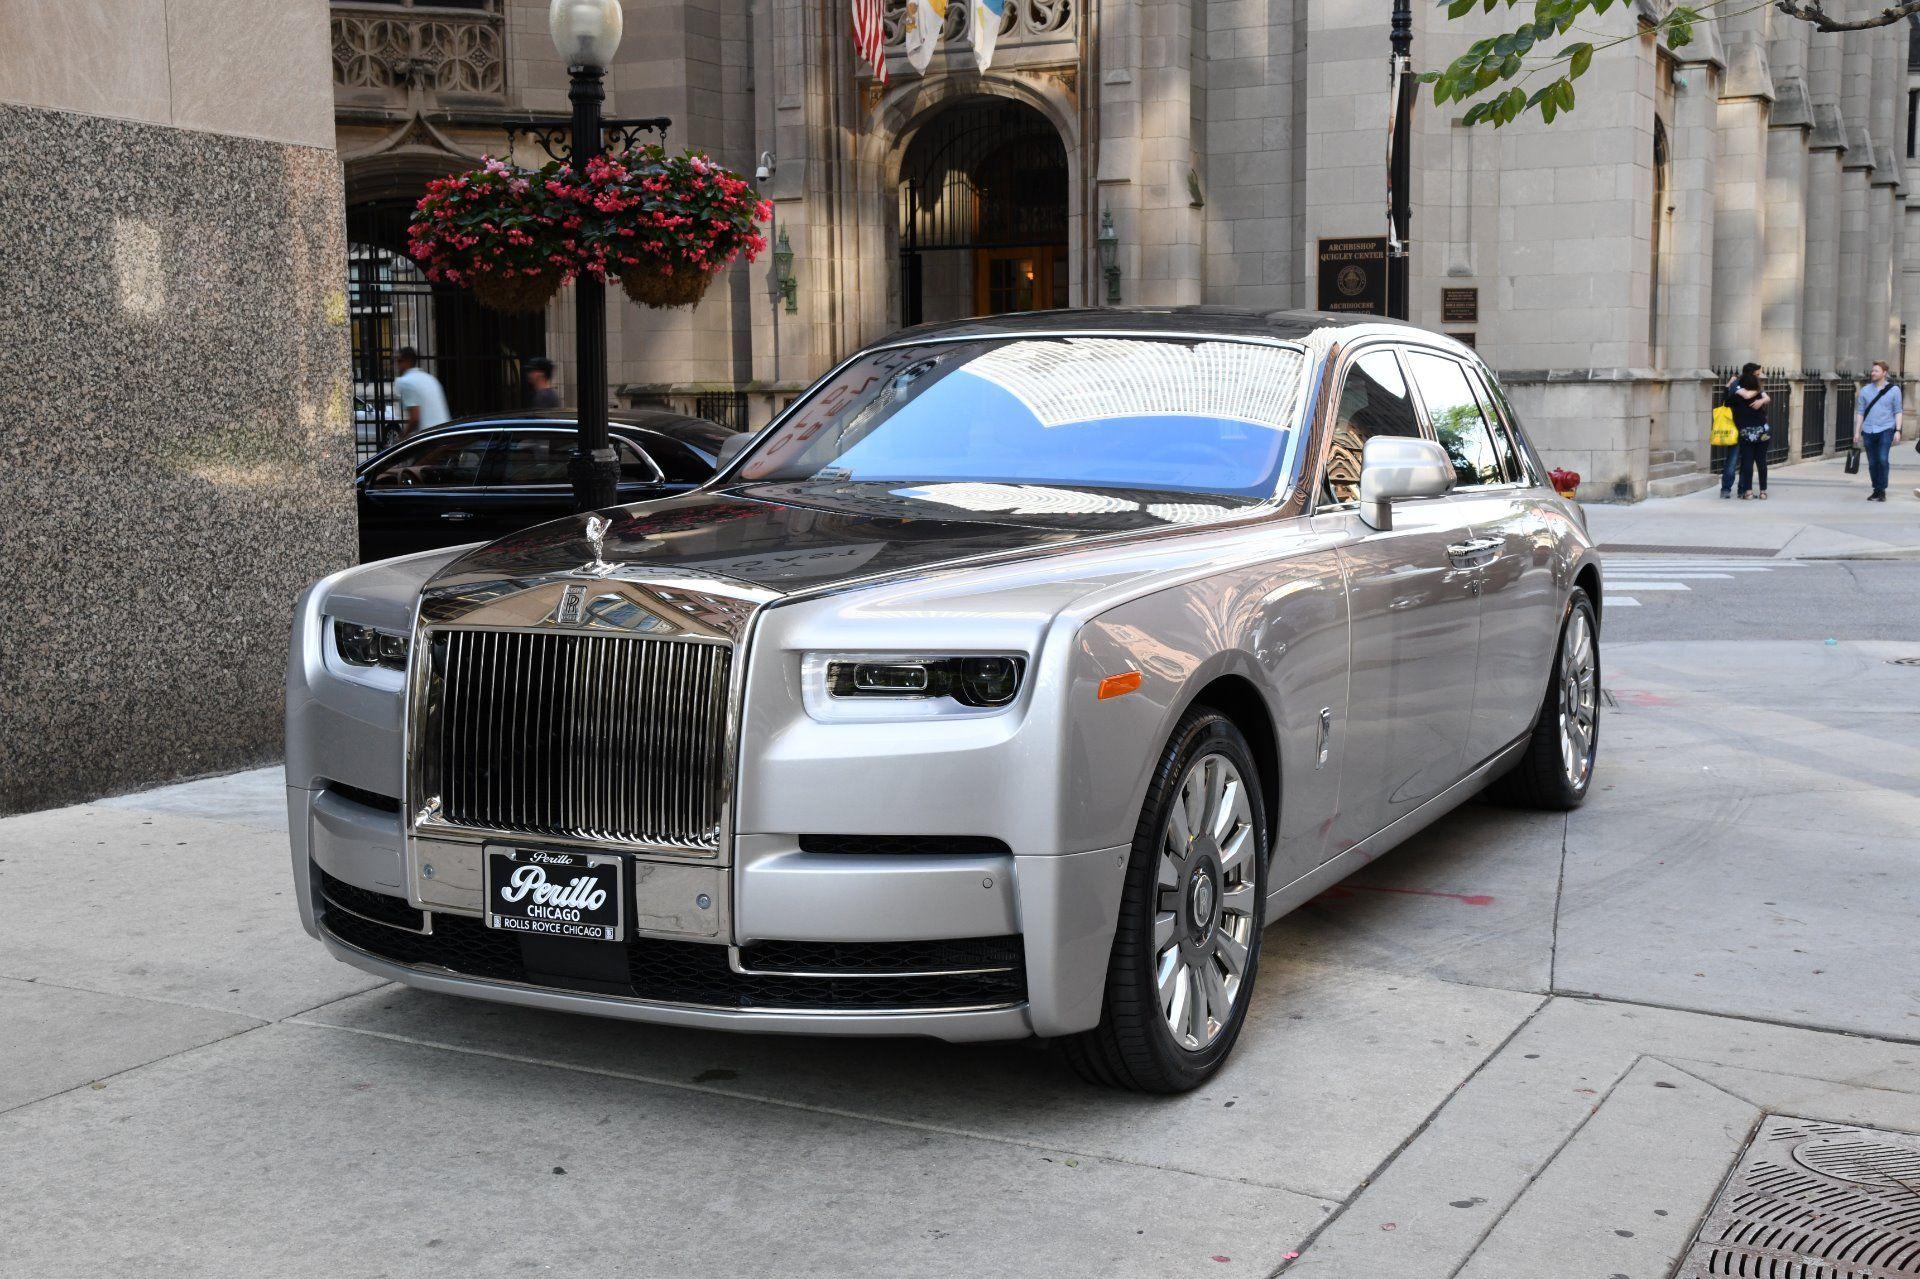 2018 Rolls Royce Phantom Stock 04631 For Sale Near Chicago Il Il Rolls Royce Dealer Rolls Royce Phantom Rolls Royce Luxury Car Dealership